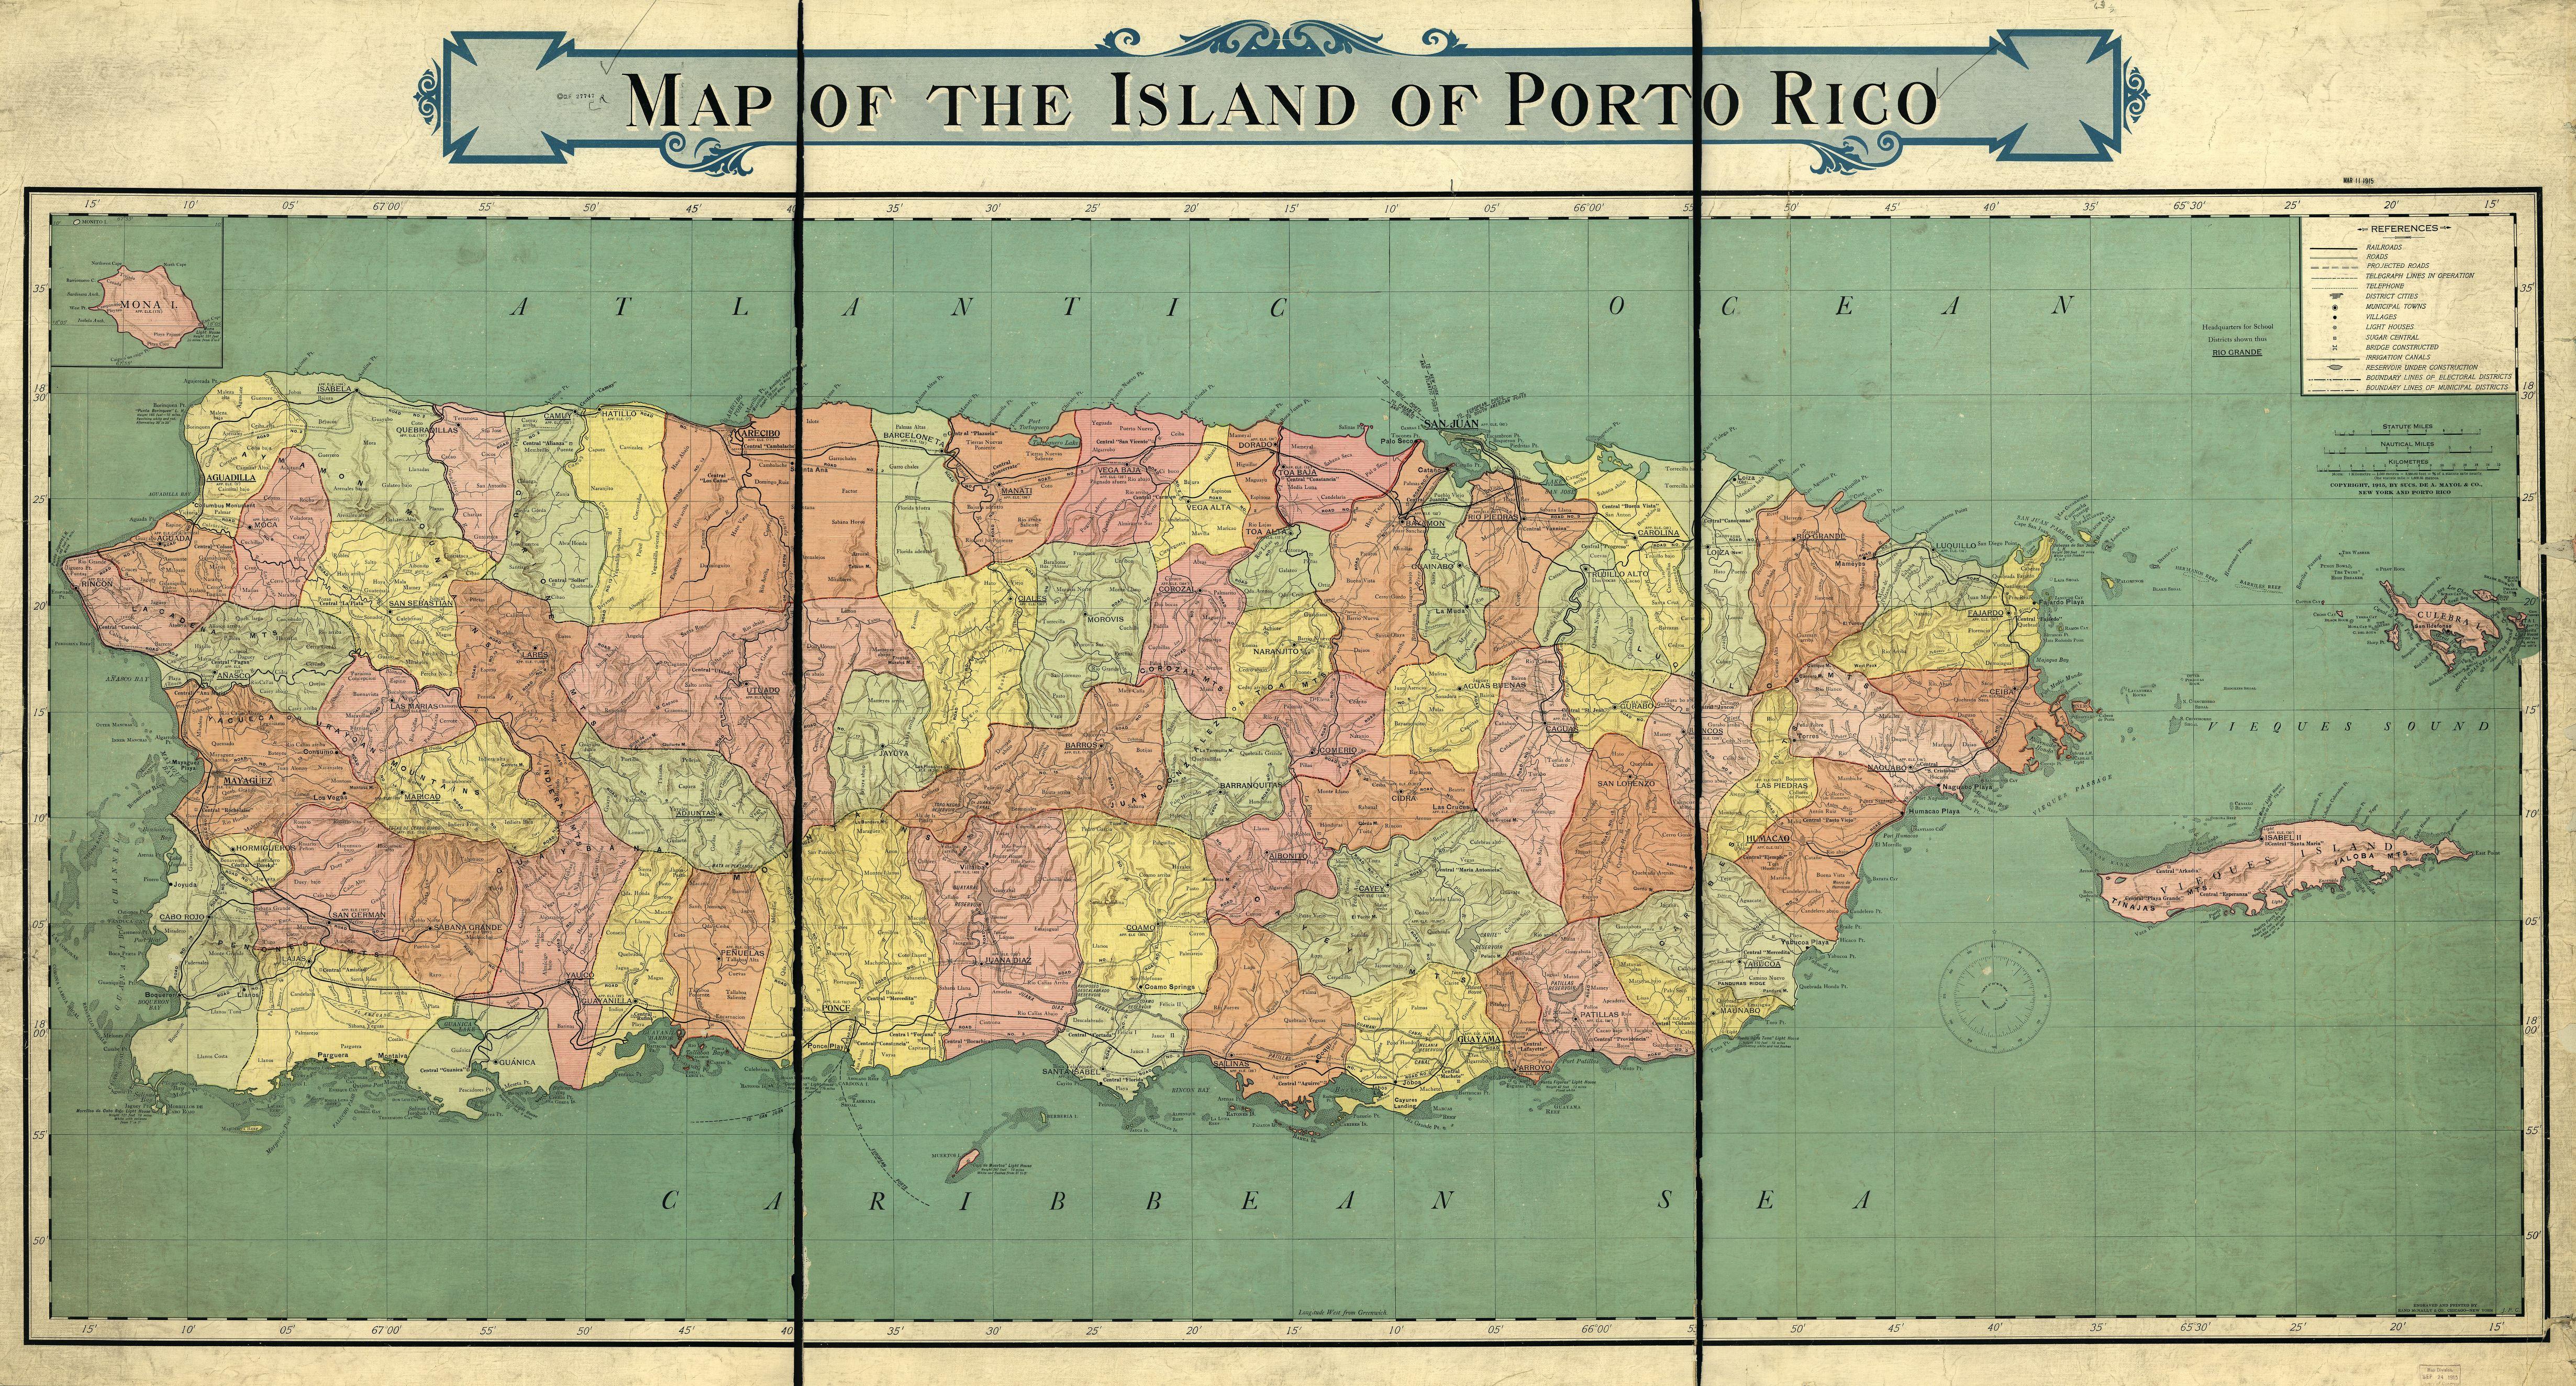 Datei:Puerto Rico 1915 Rand McNally map.jpg – Wikipedia